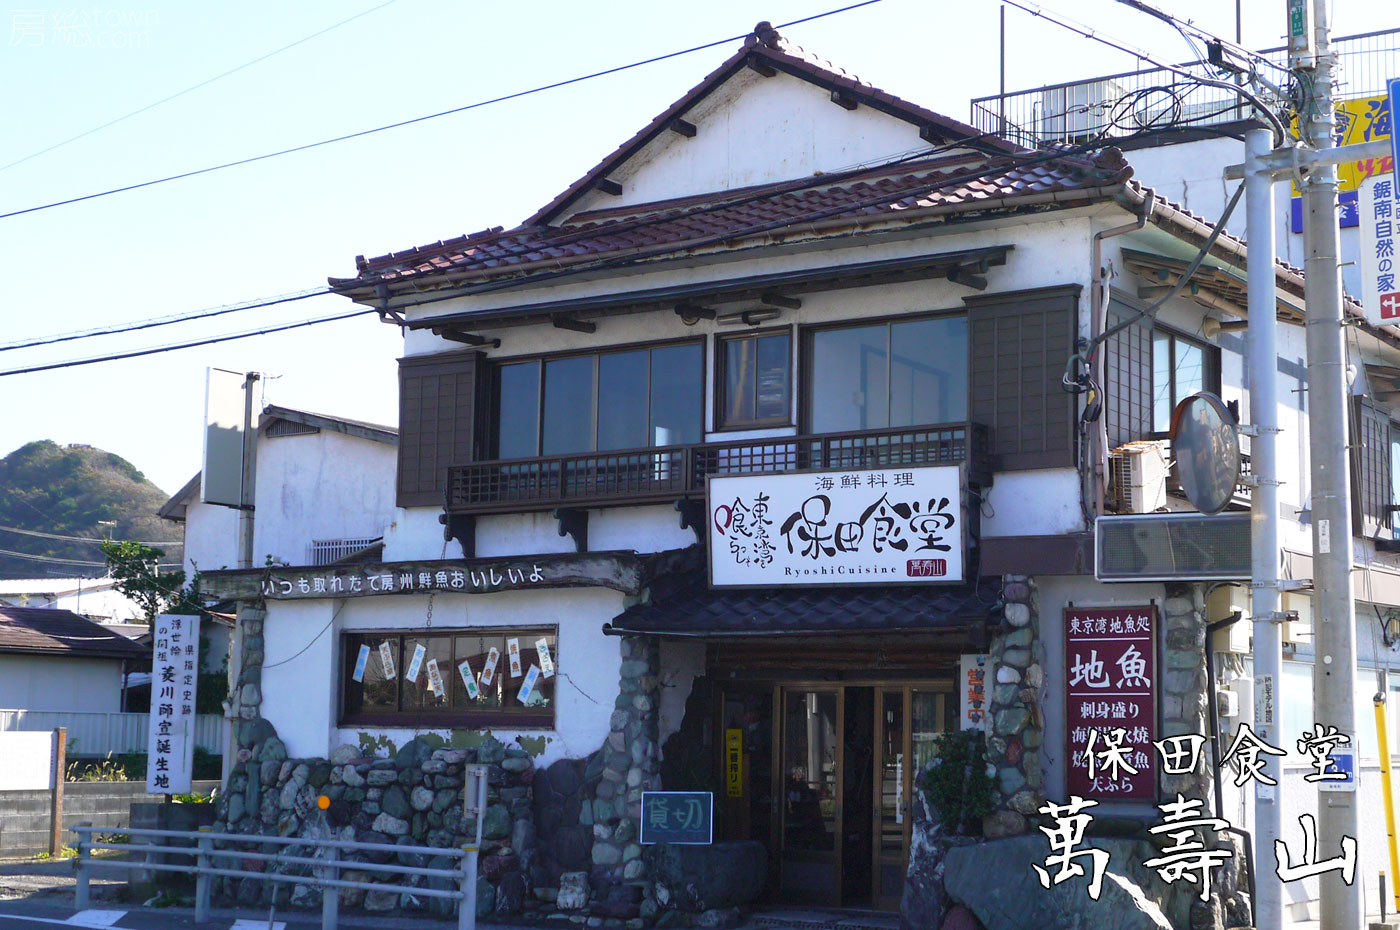 保田食堂 萬壽山の外観